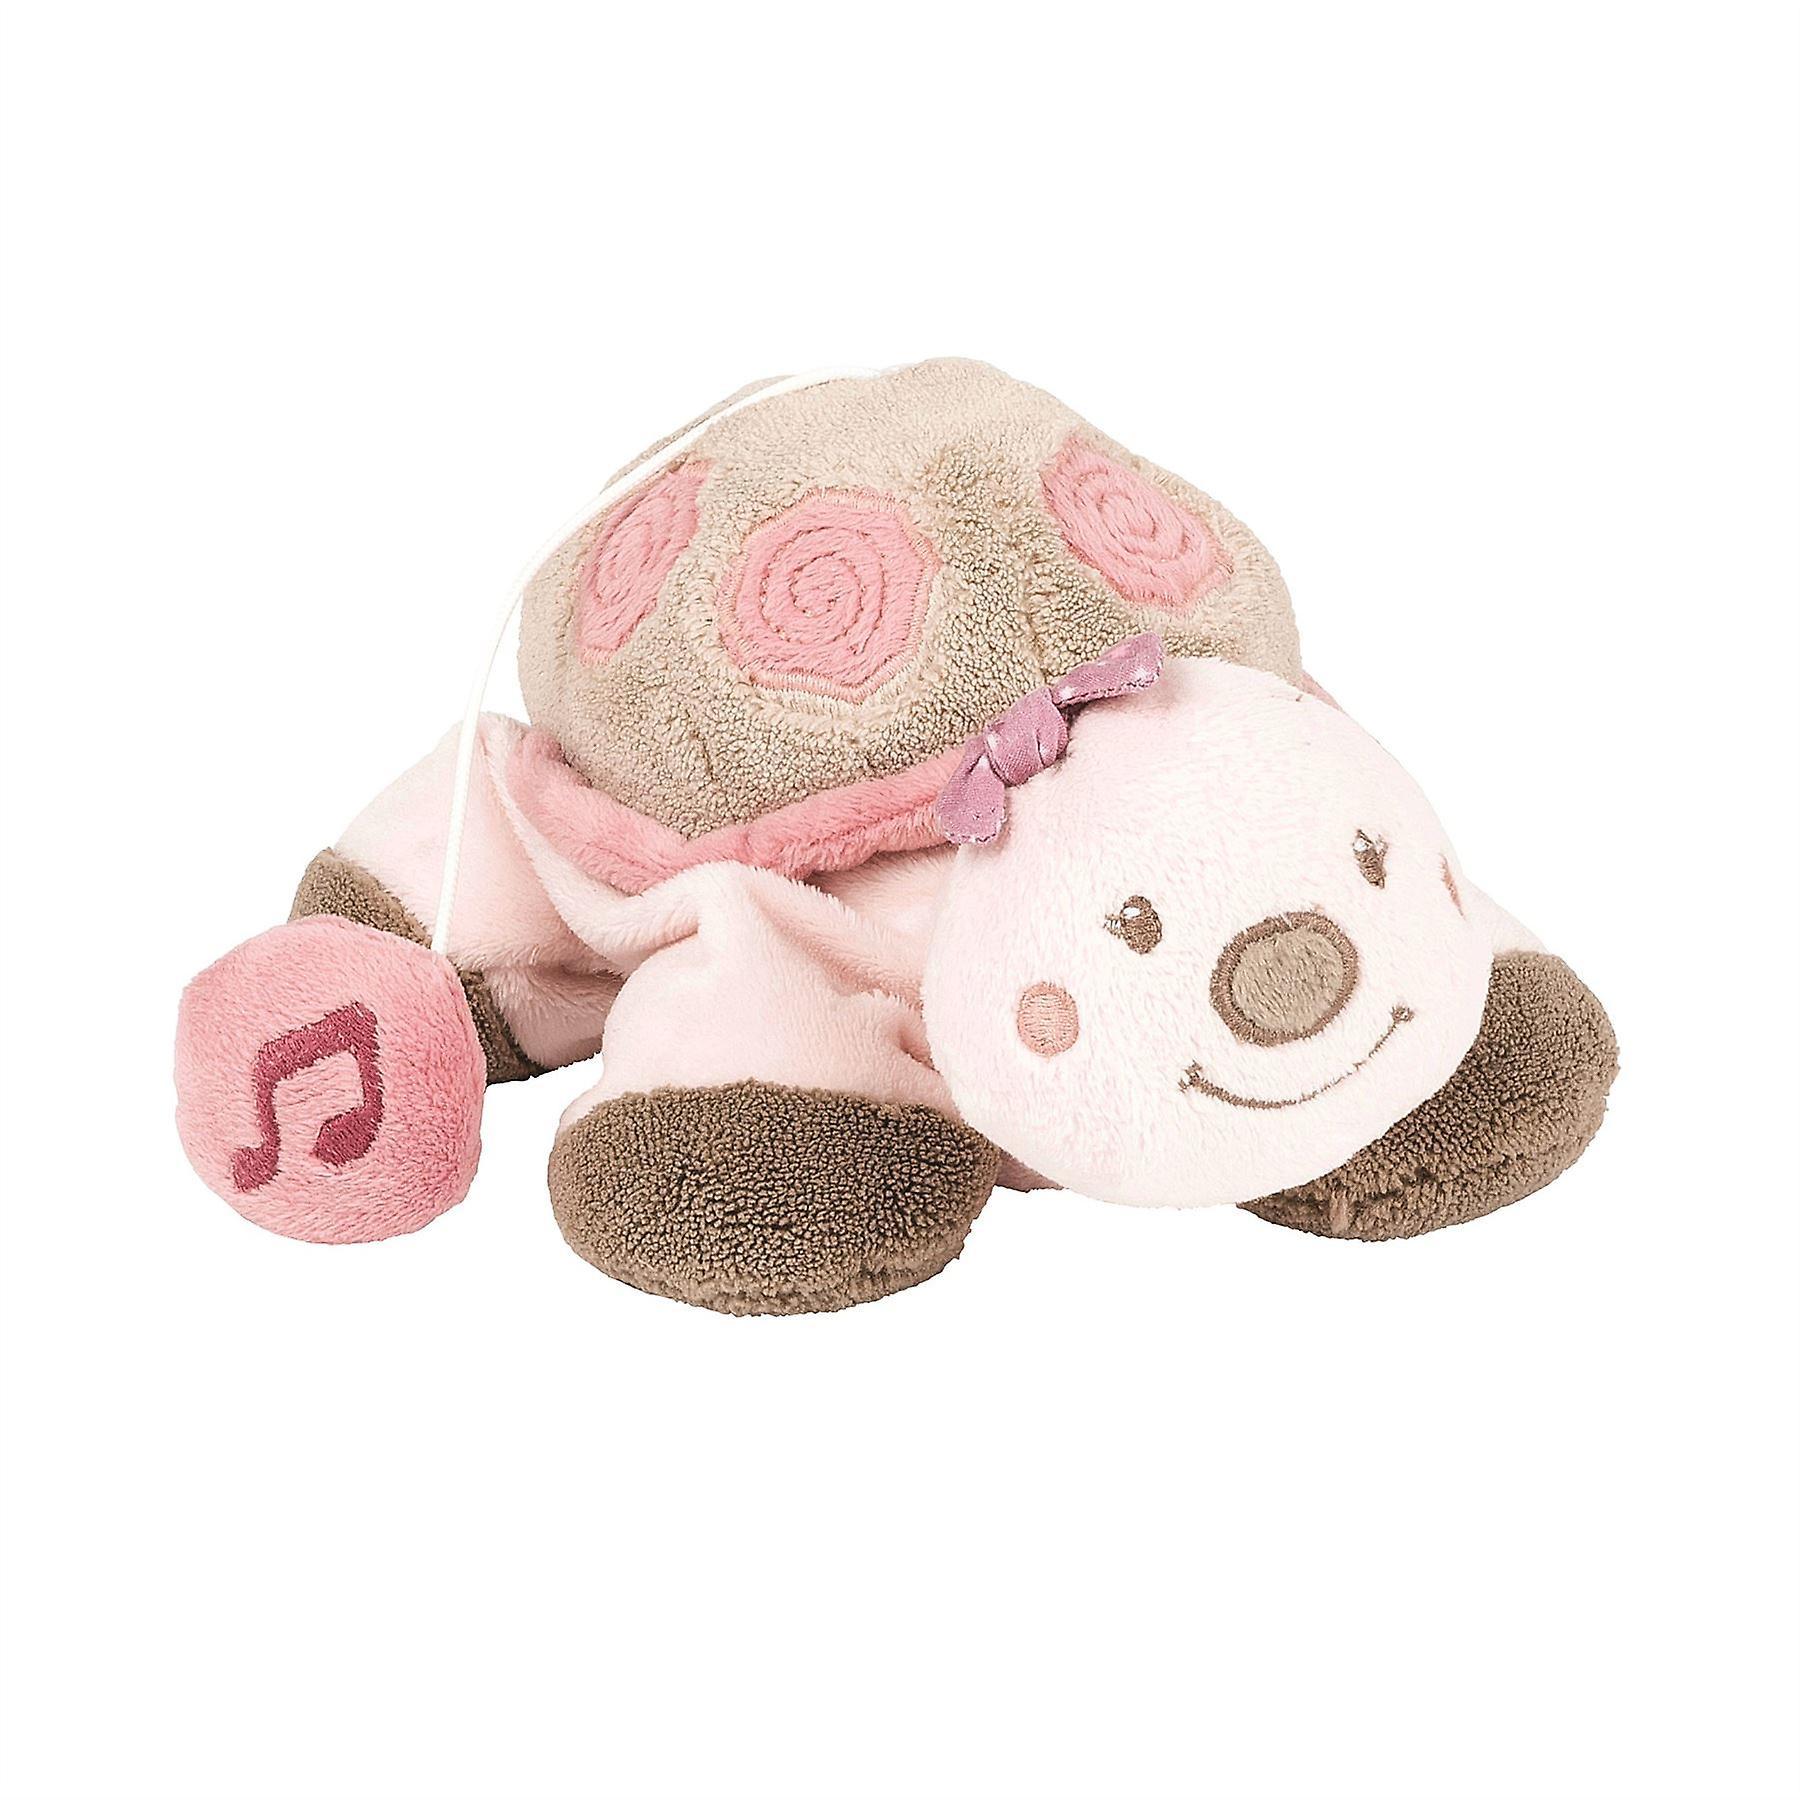 Nattou Nina, Jade & Lili- Musical Lili The Turtle soft toy